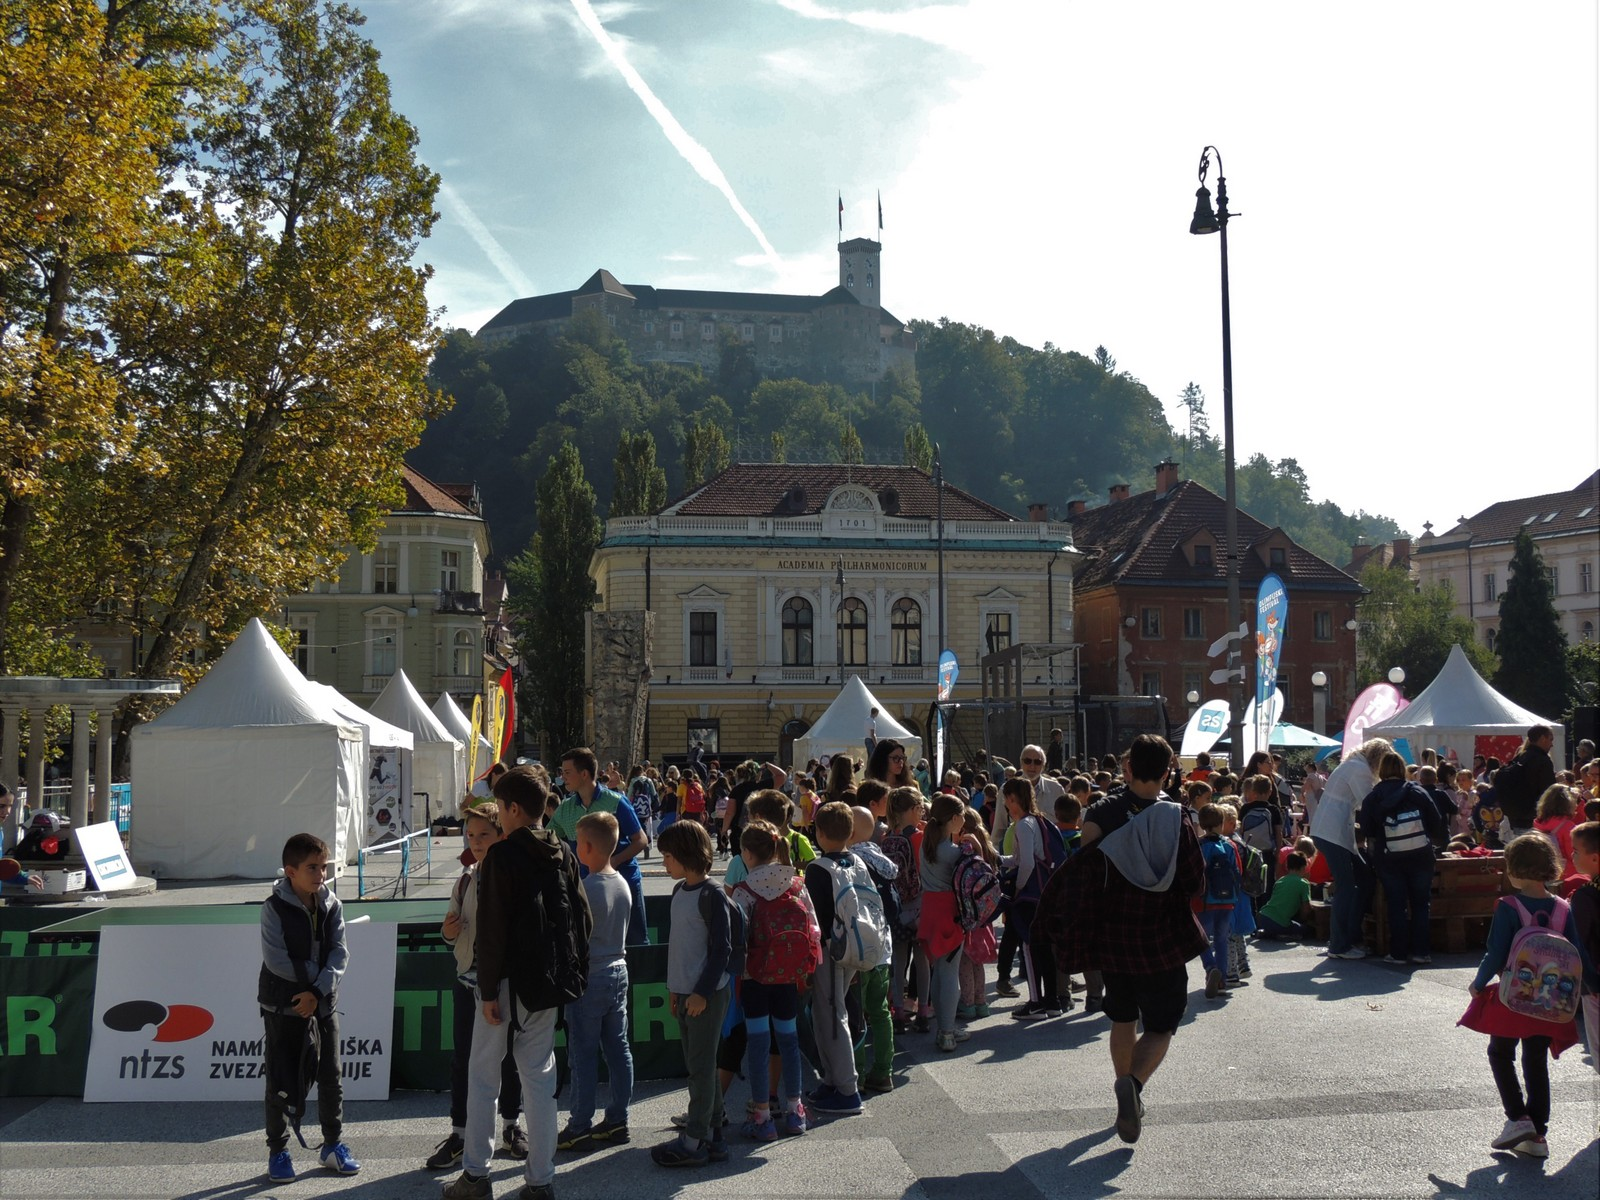 Kongressplatz von Ljubljana